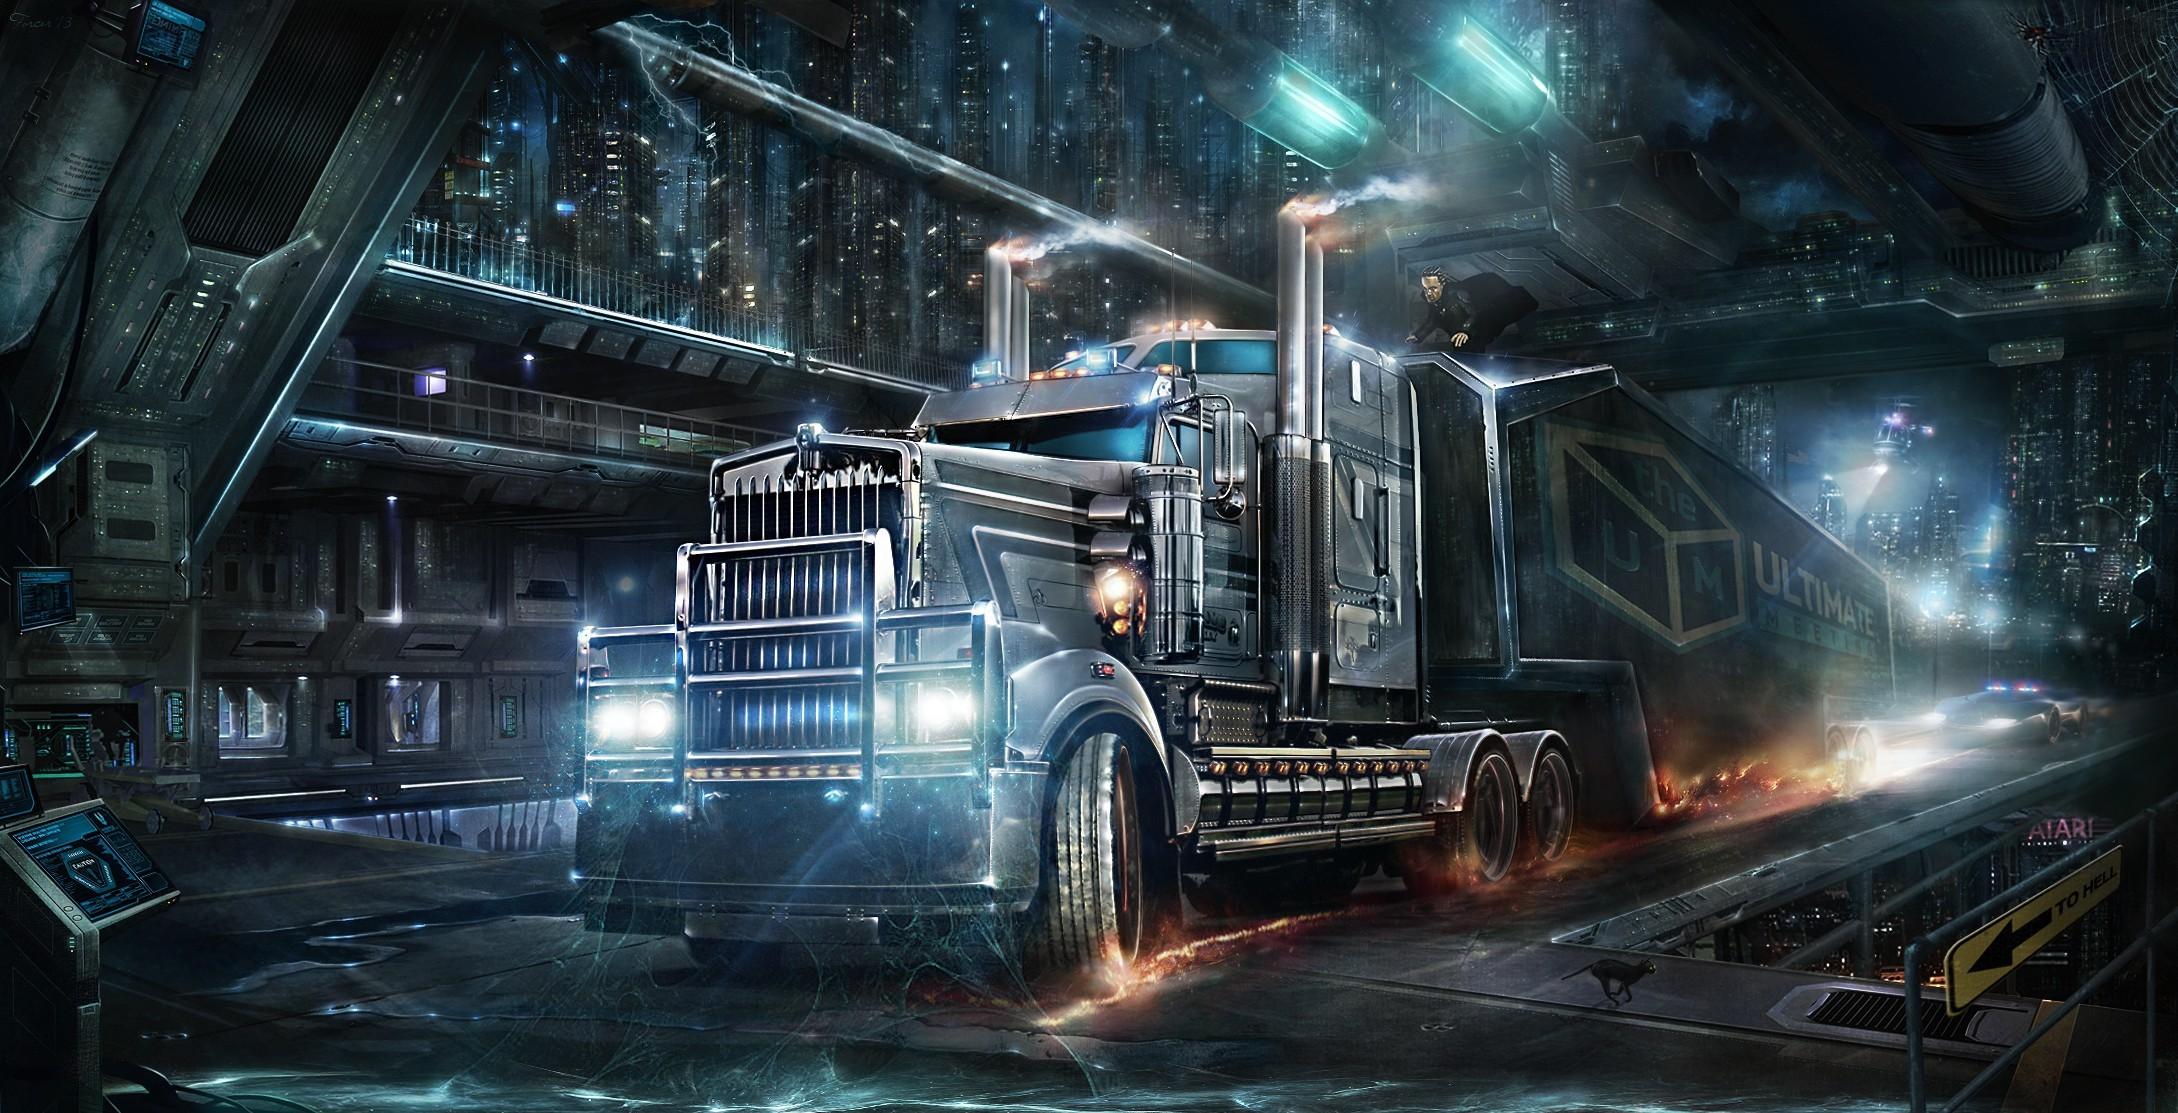 … road train heavy truck wallpaper hdwallpaperfx …